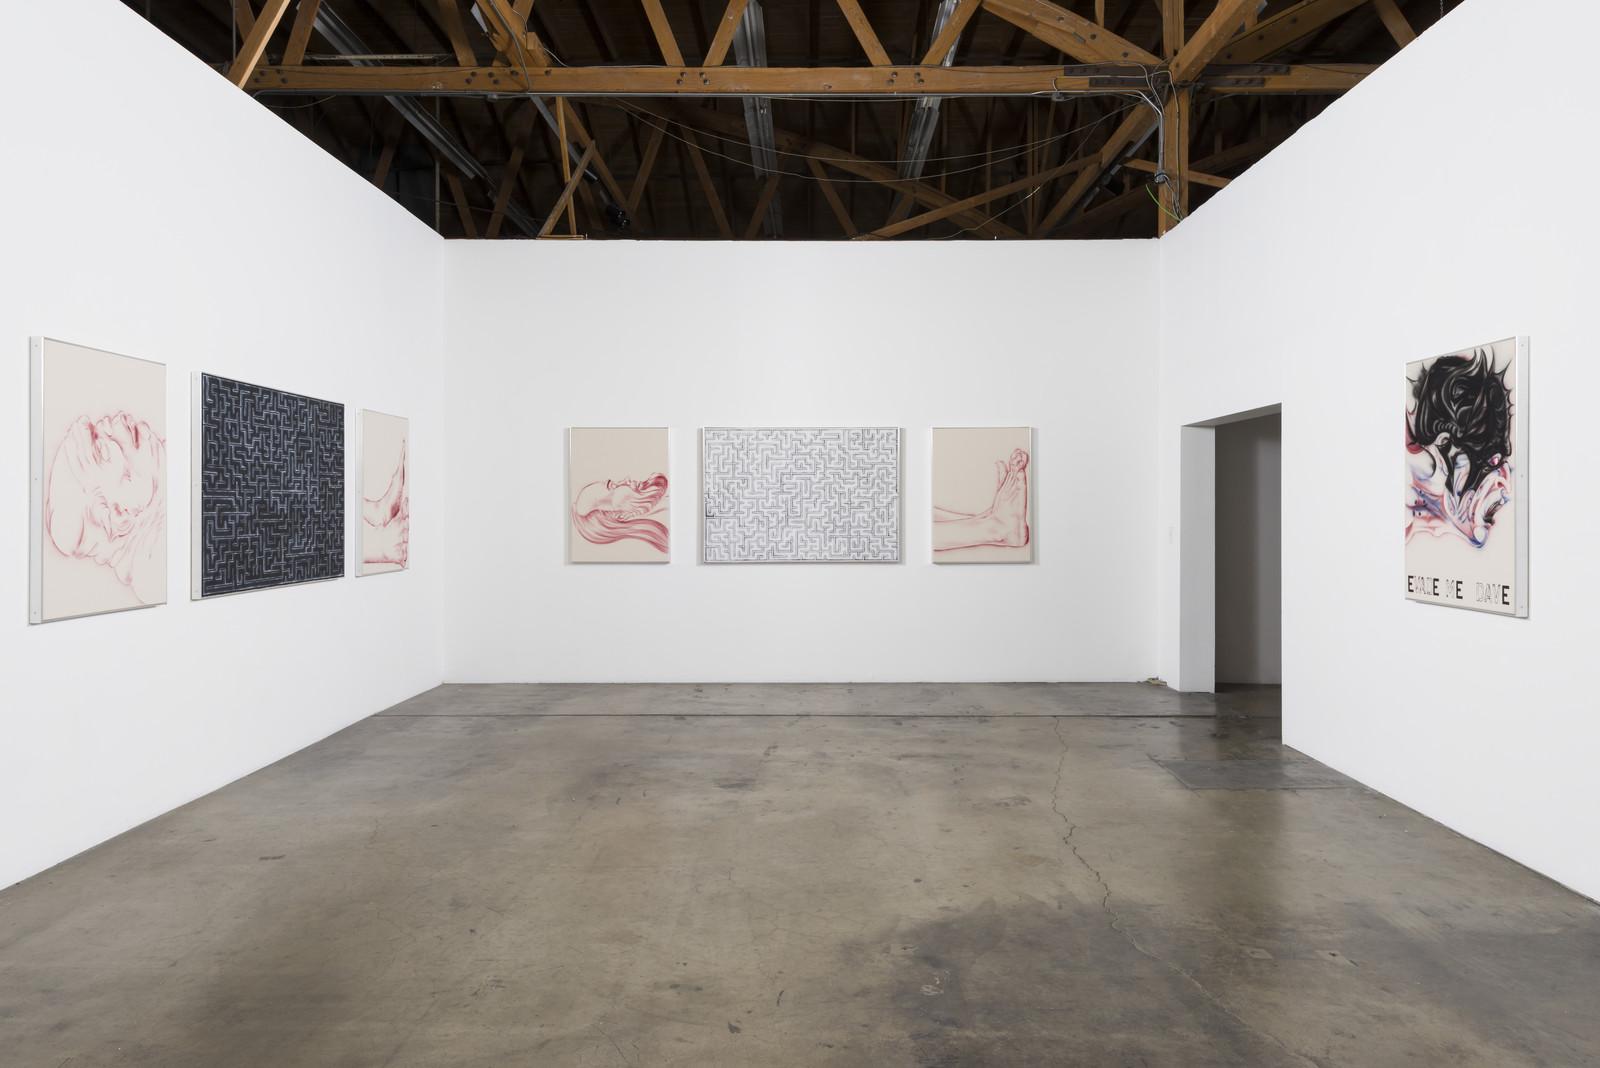 1_Installation View, Zoe Barcza, DR AWKWARD, Ghebaly Gallery